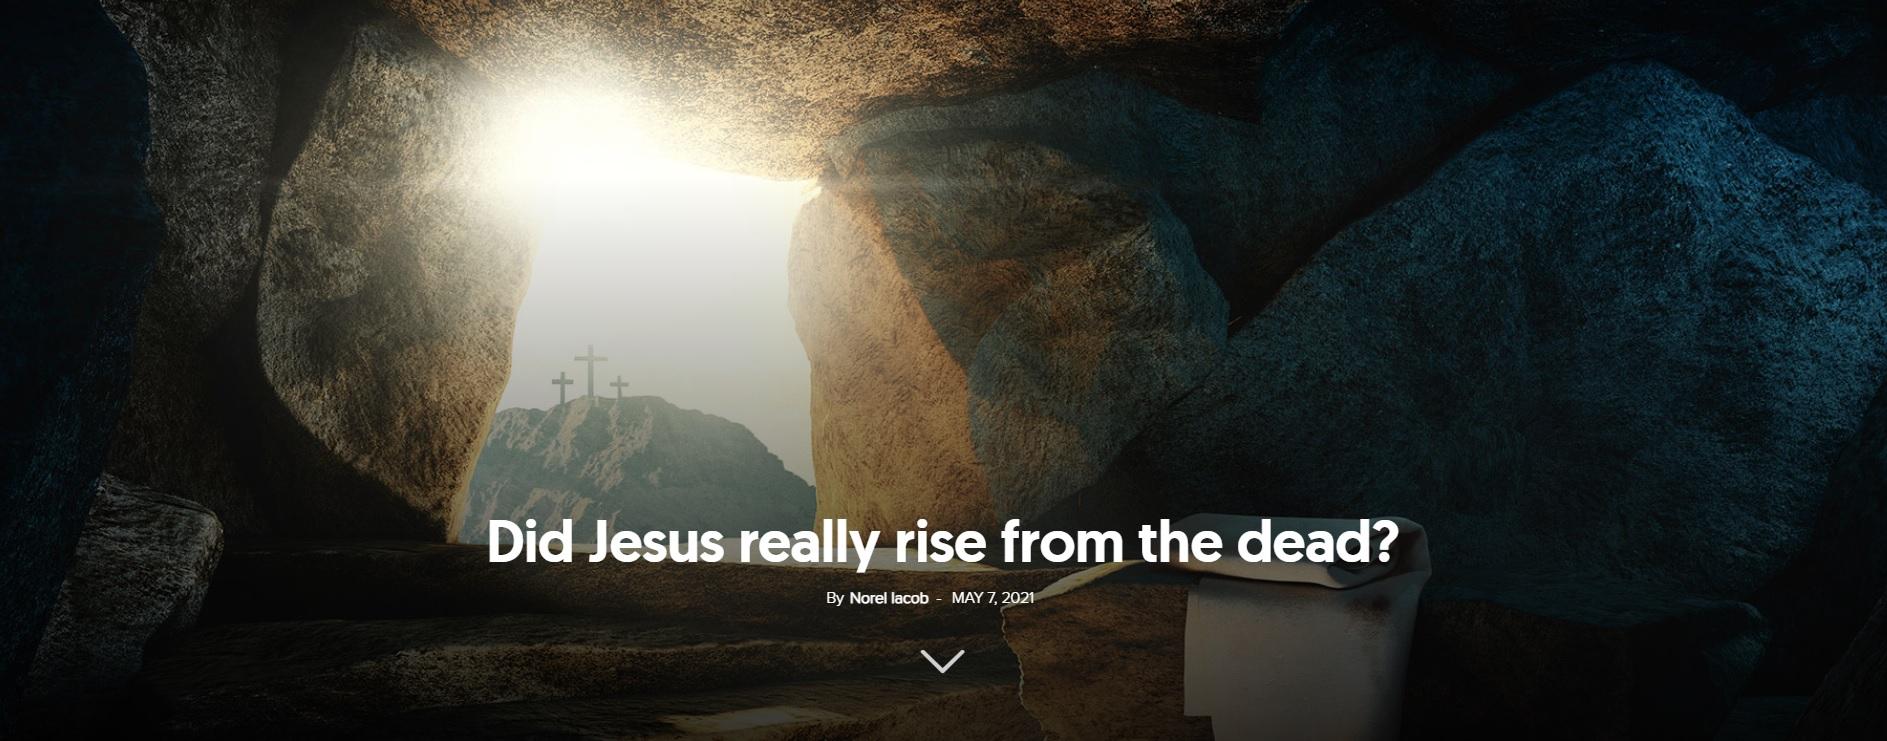 historicity of jesus